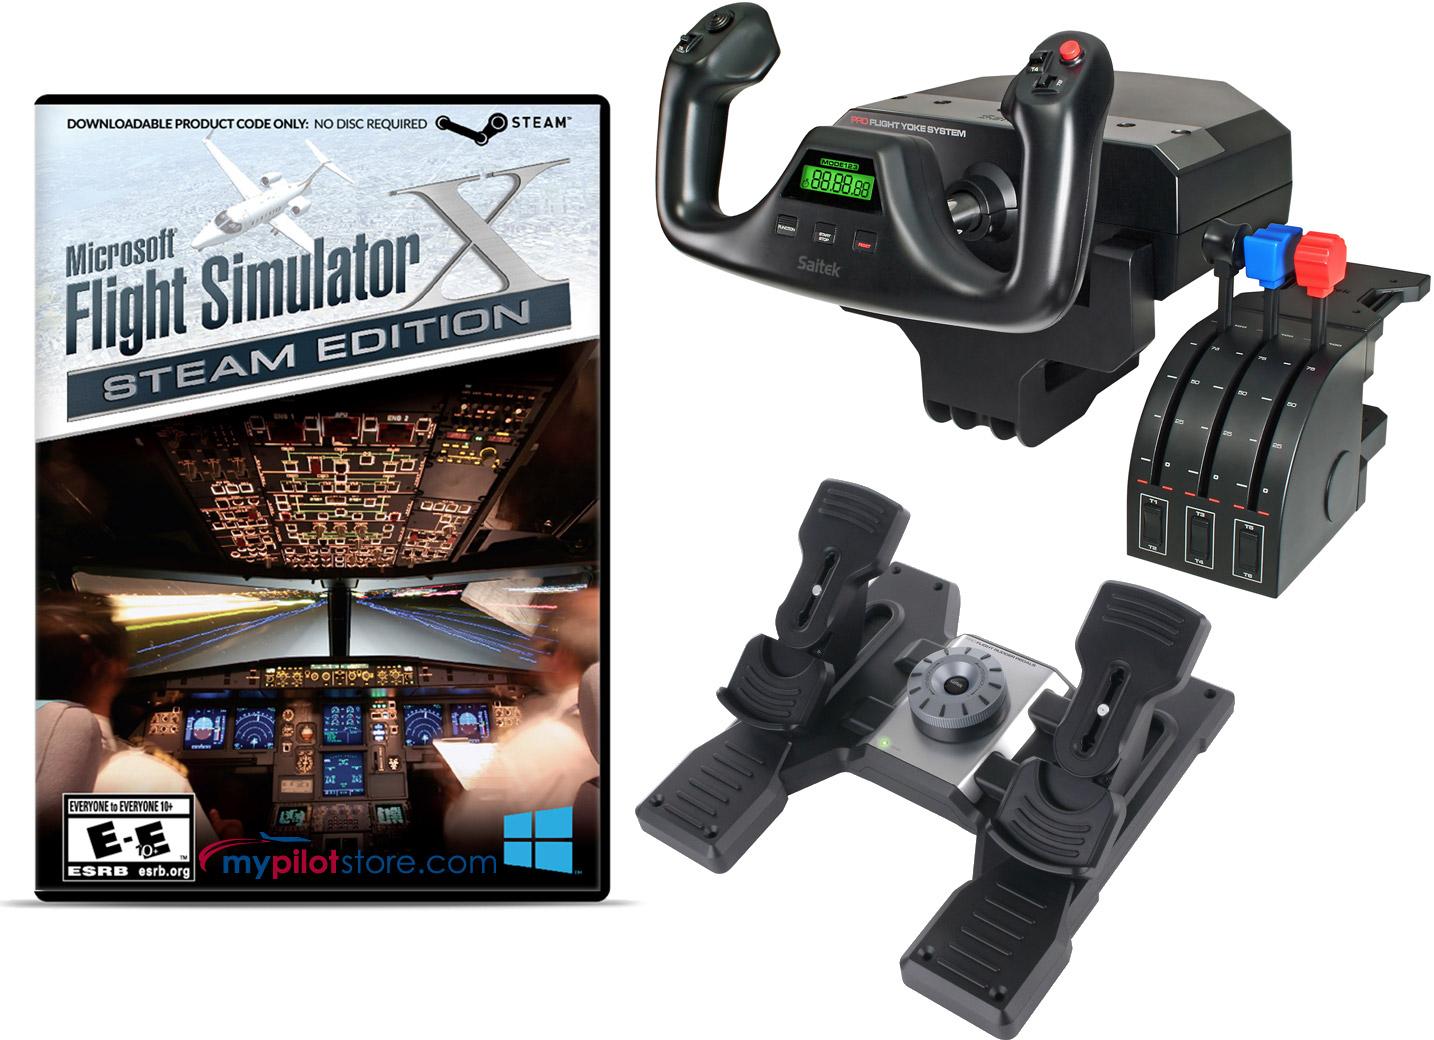 Deluxe Saitek Flight Simulator Bundle - MS Flight Sim X, Yoke & Throttle,  and Rudders